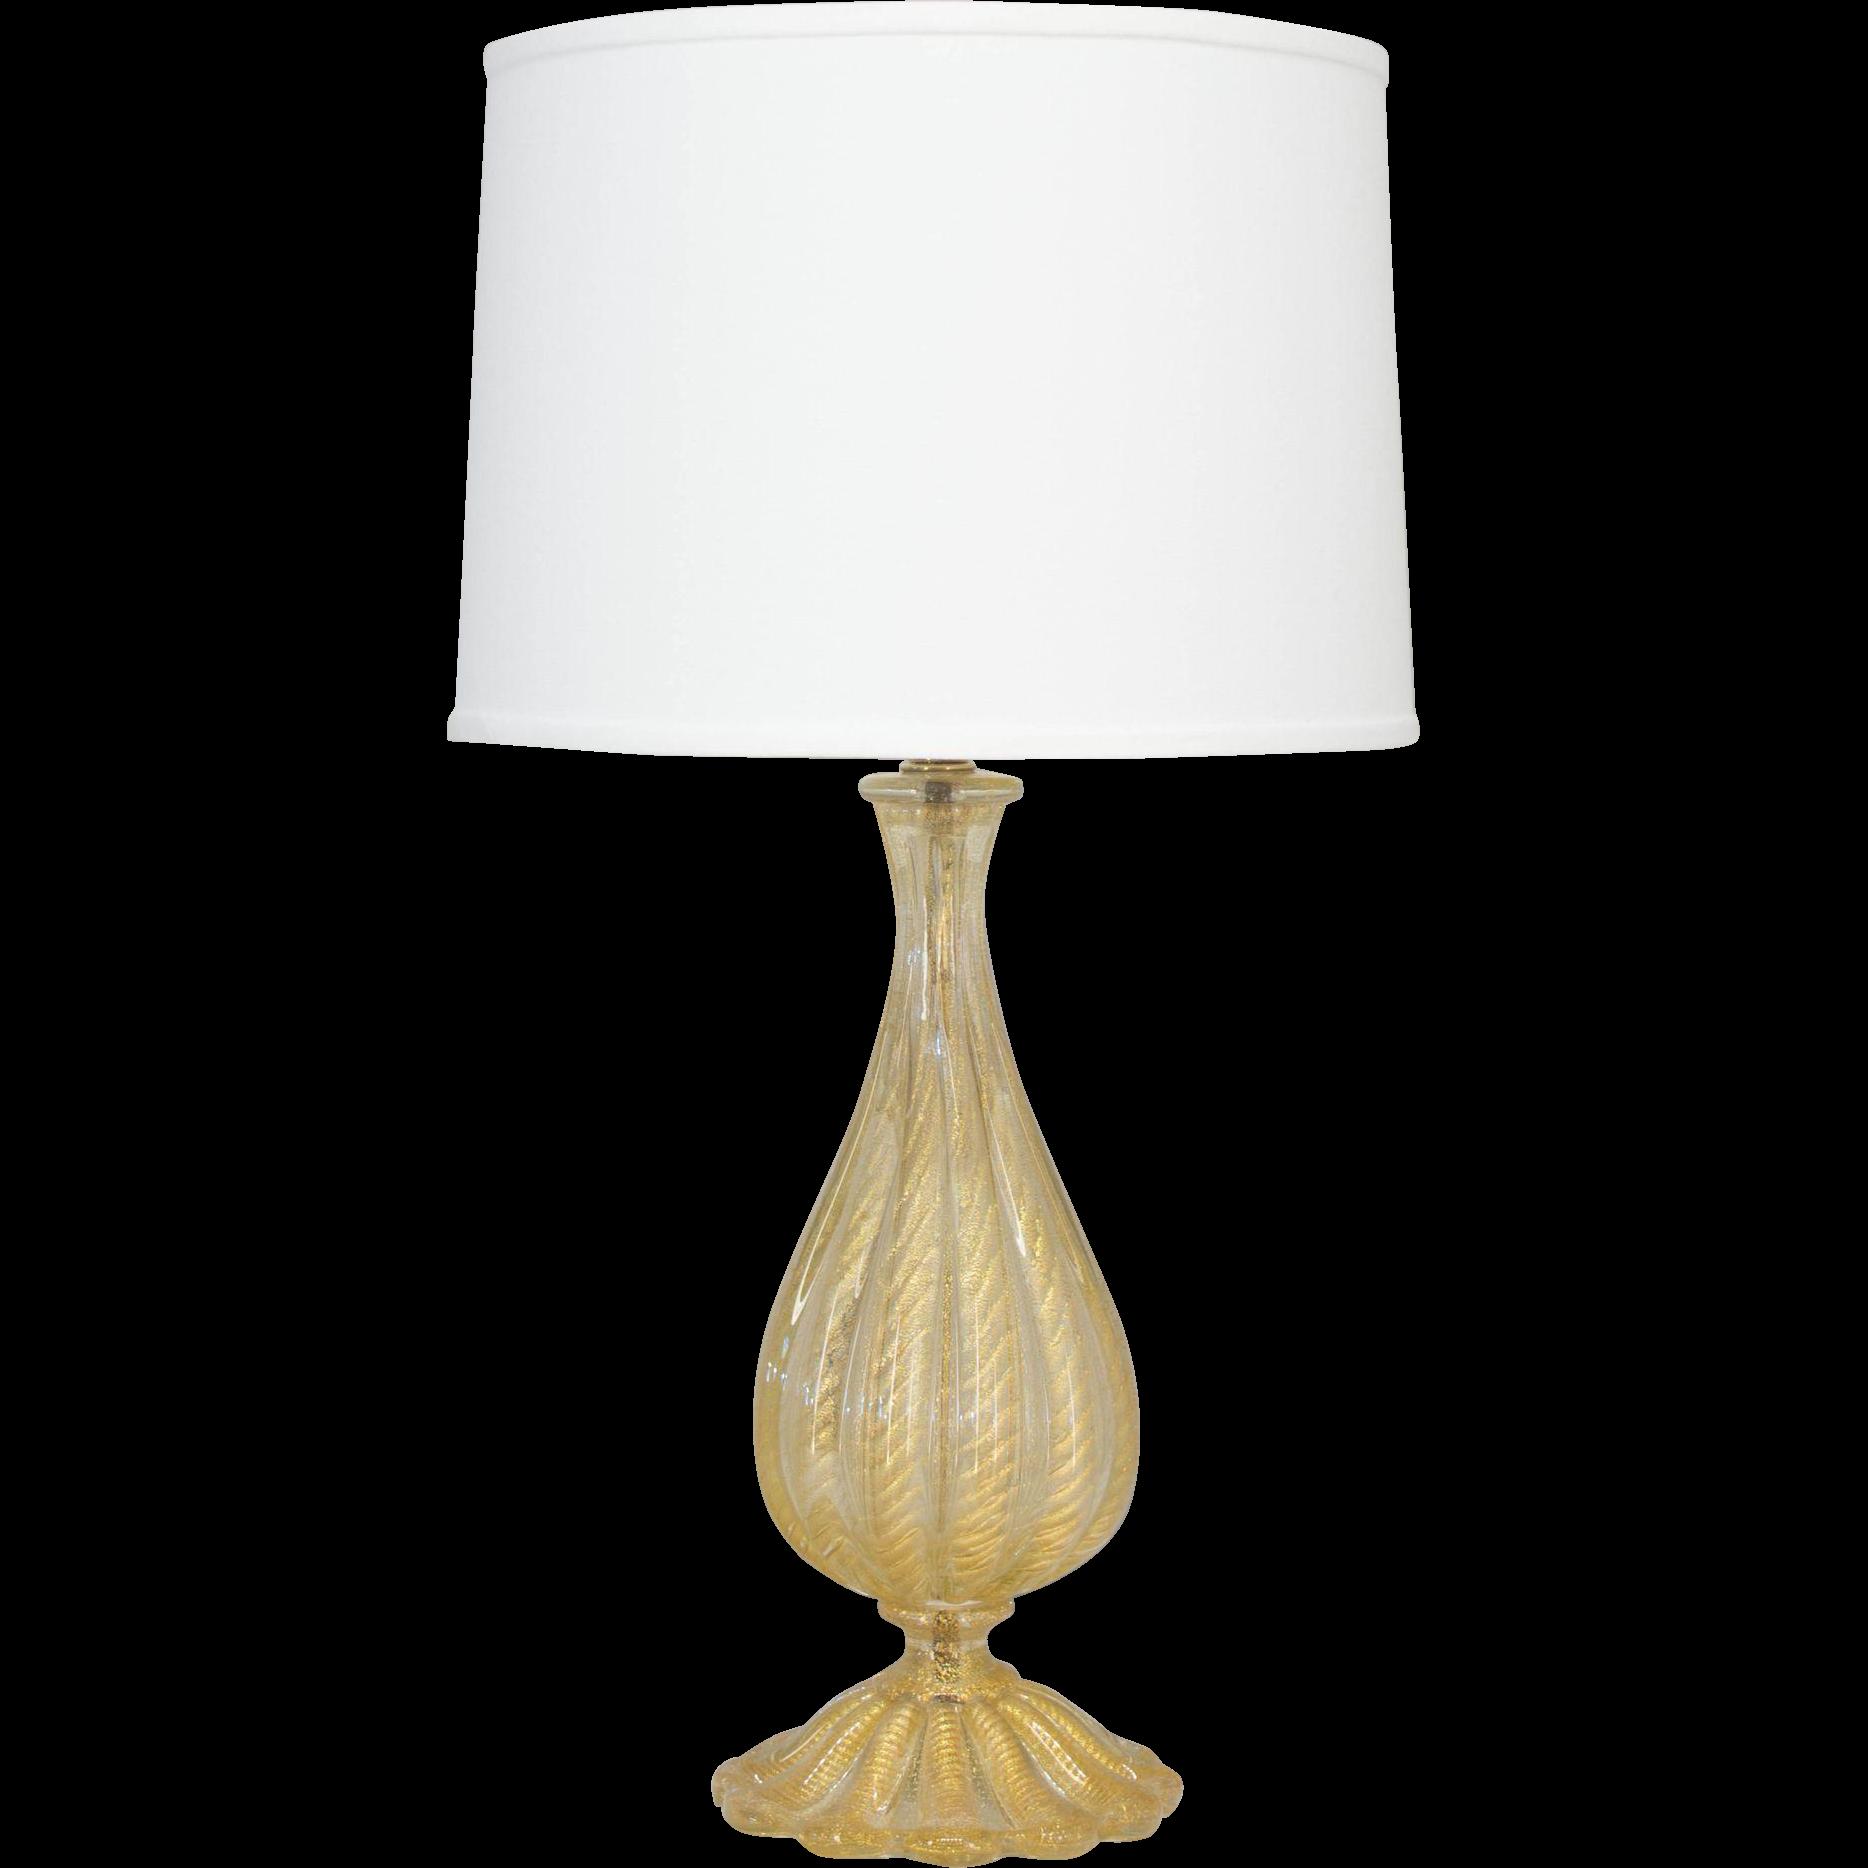 Murano gl floor lamp murano gl floor lamps 173 for at 1stdibs - Mid Century Murano Glass Lamp By Barovier Toso Hand Blown Glass Cordonato D